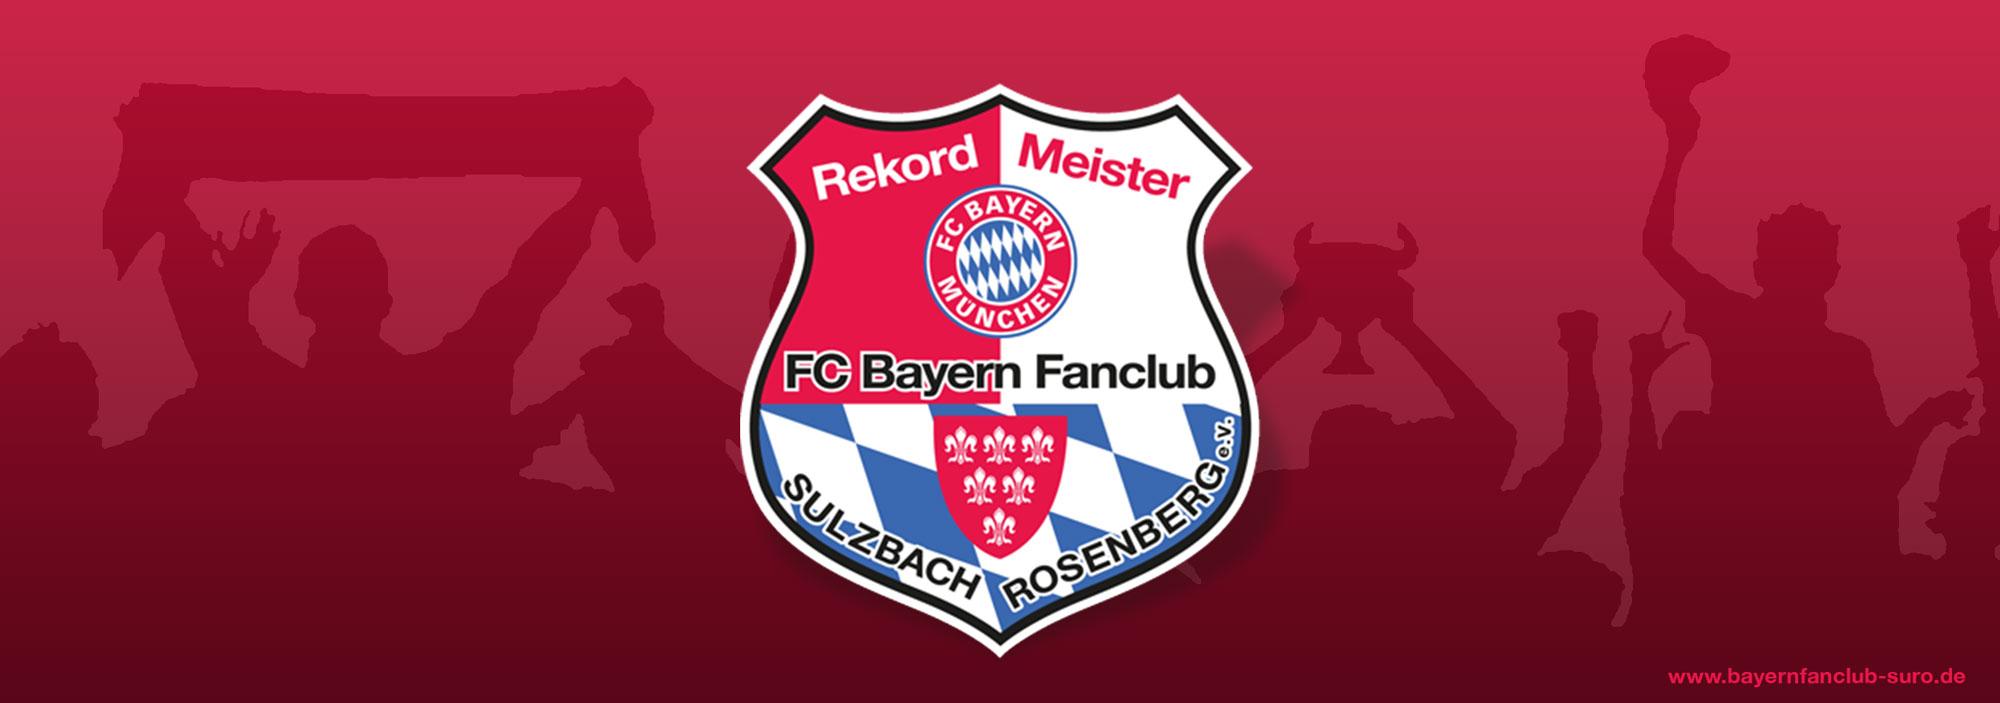 Fc Bayern Fanclub Sulzbach Rosenberg Ev Fazit Zur Saison 2017